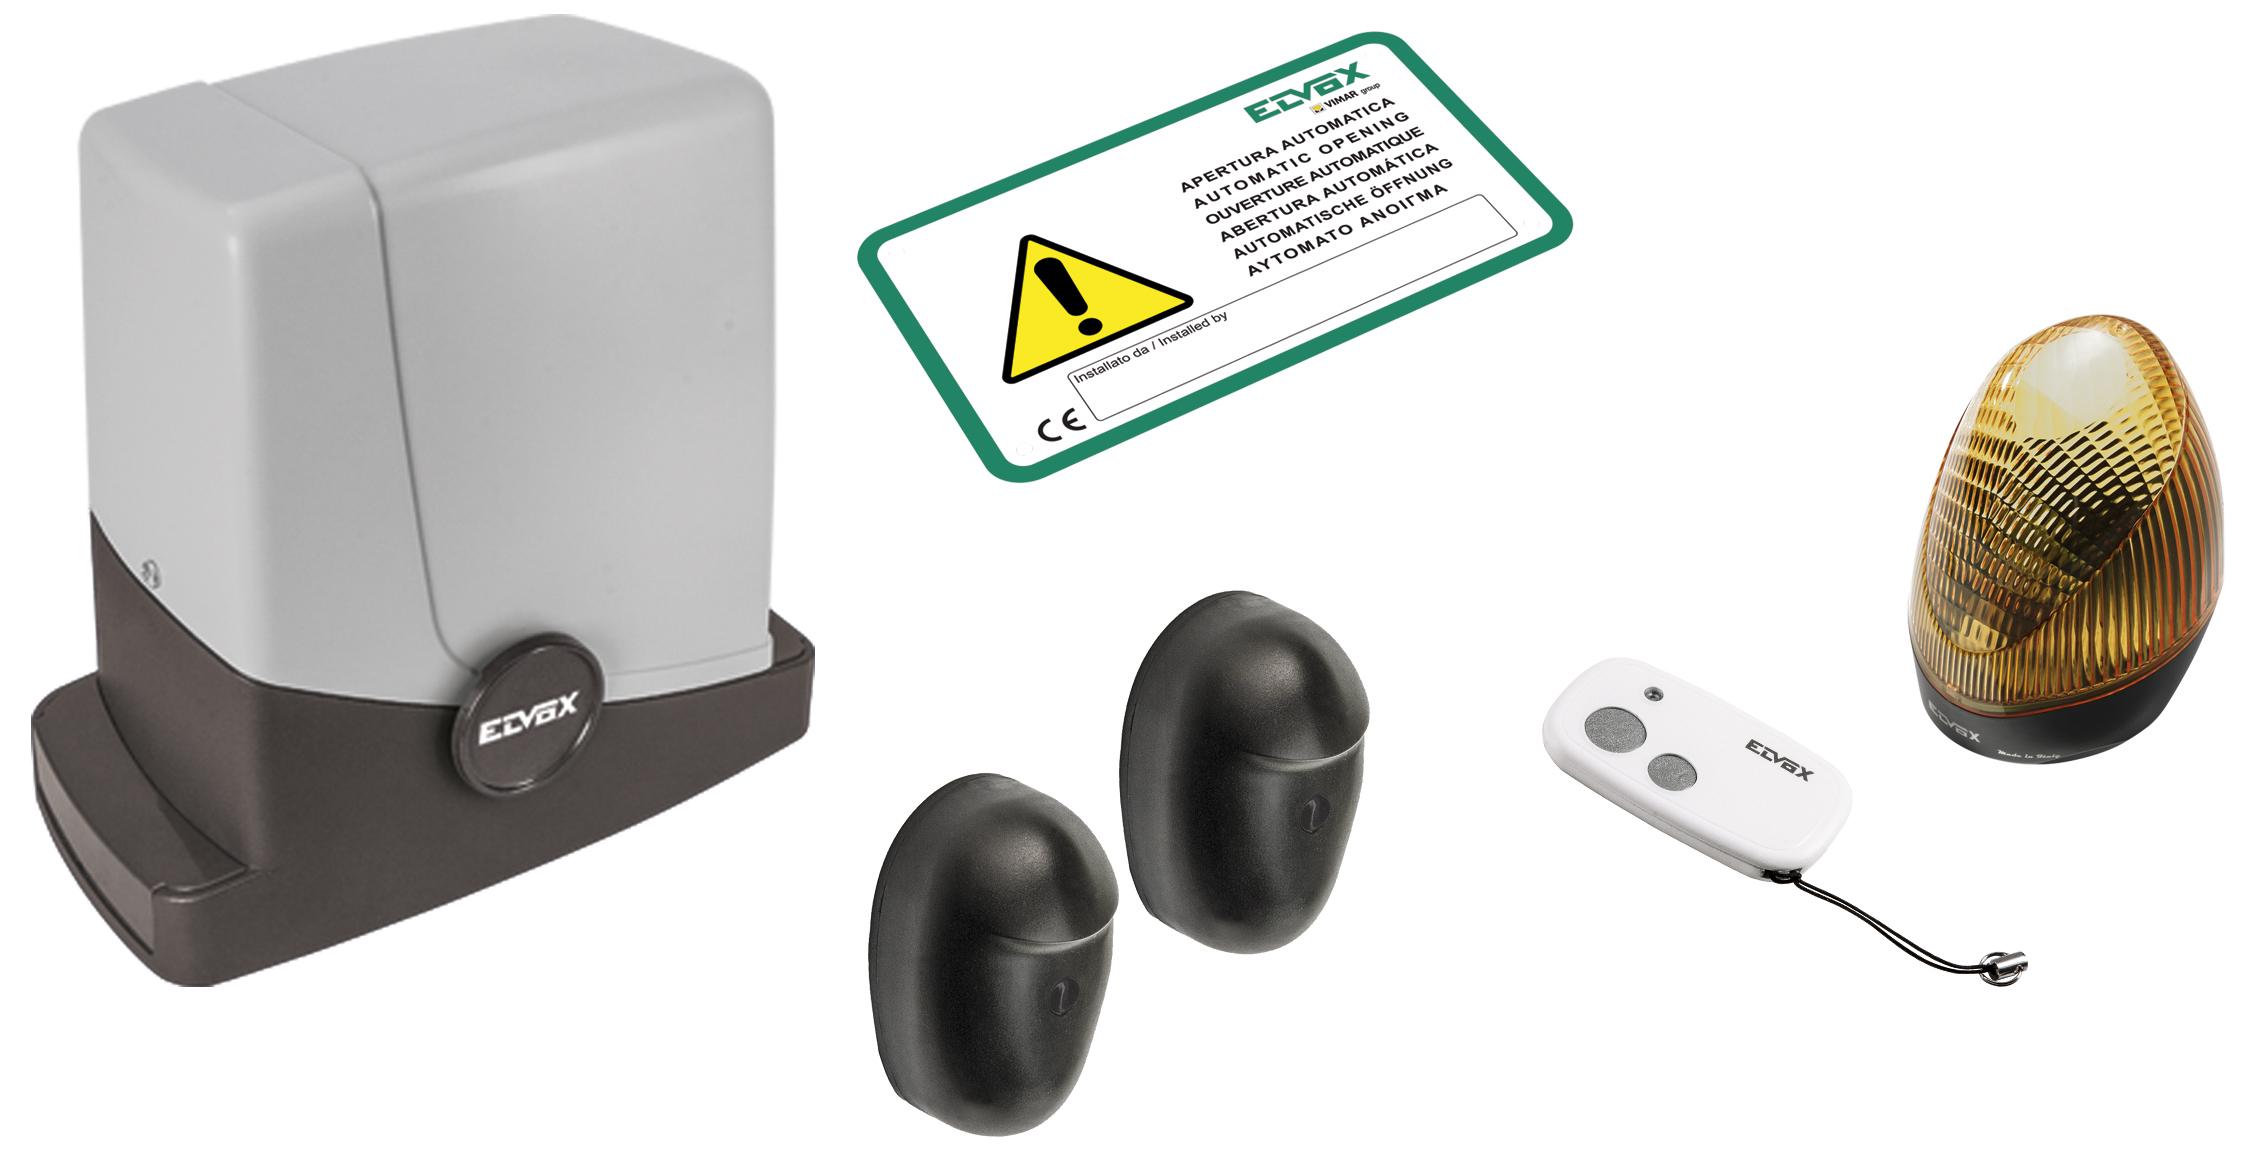 Scorrevoli: Kit ACTO 404D scorrevole 24V 400kg - EK14 - Catalogo Prodotti - Vimar energia positiva